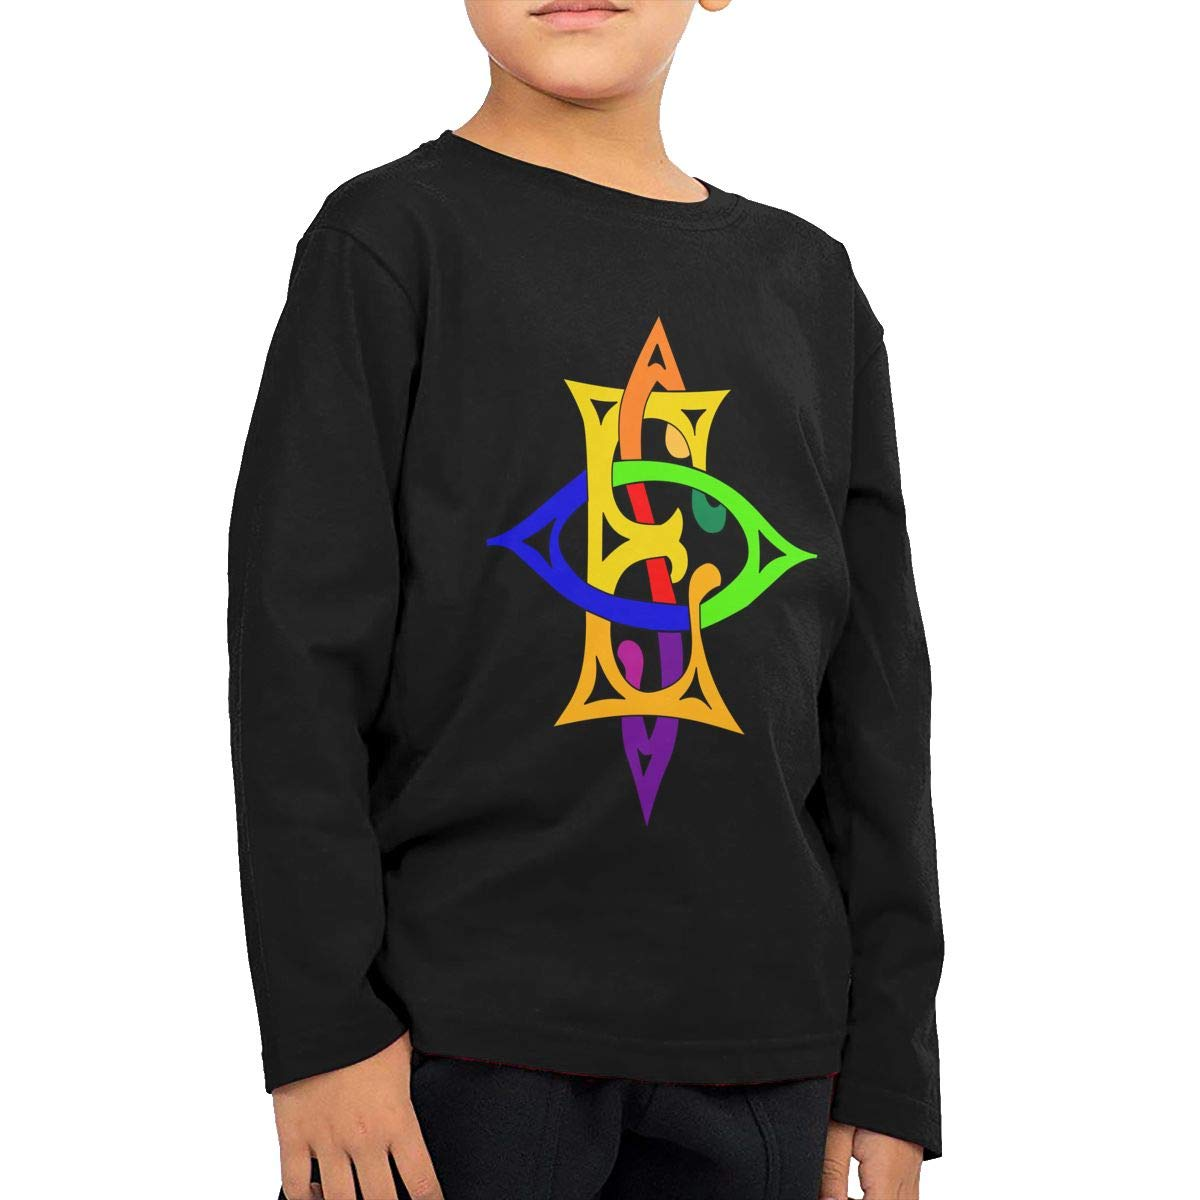 HADYKIDSLOVE OES Labyrinth Kids T-Shirt Long Sleeve Boys Girls T-Shirt